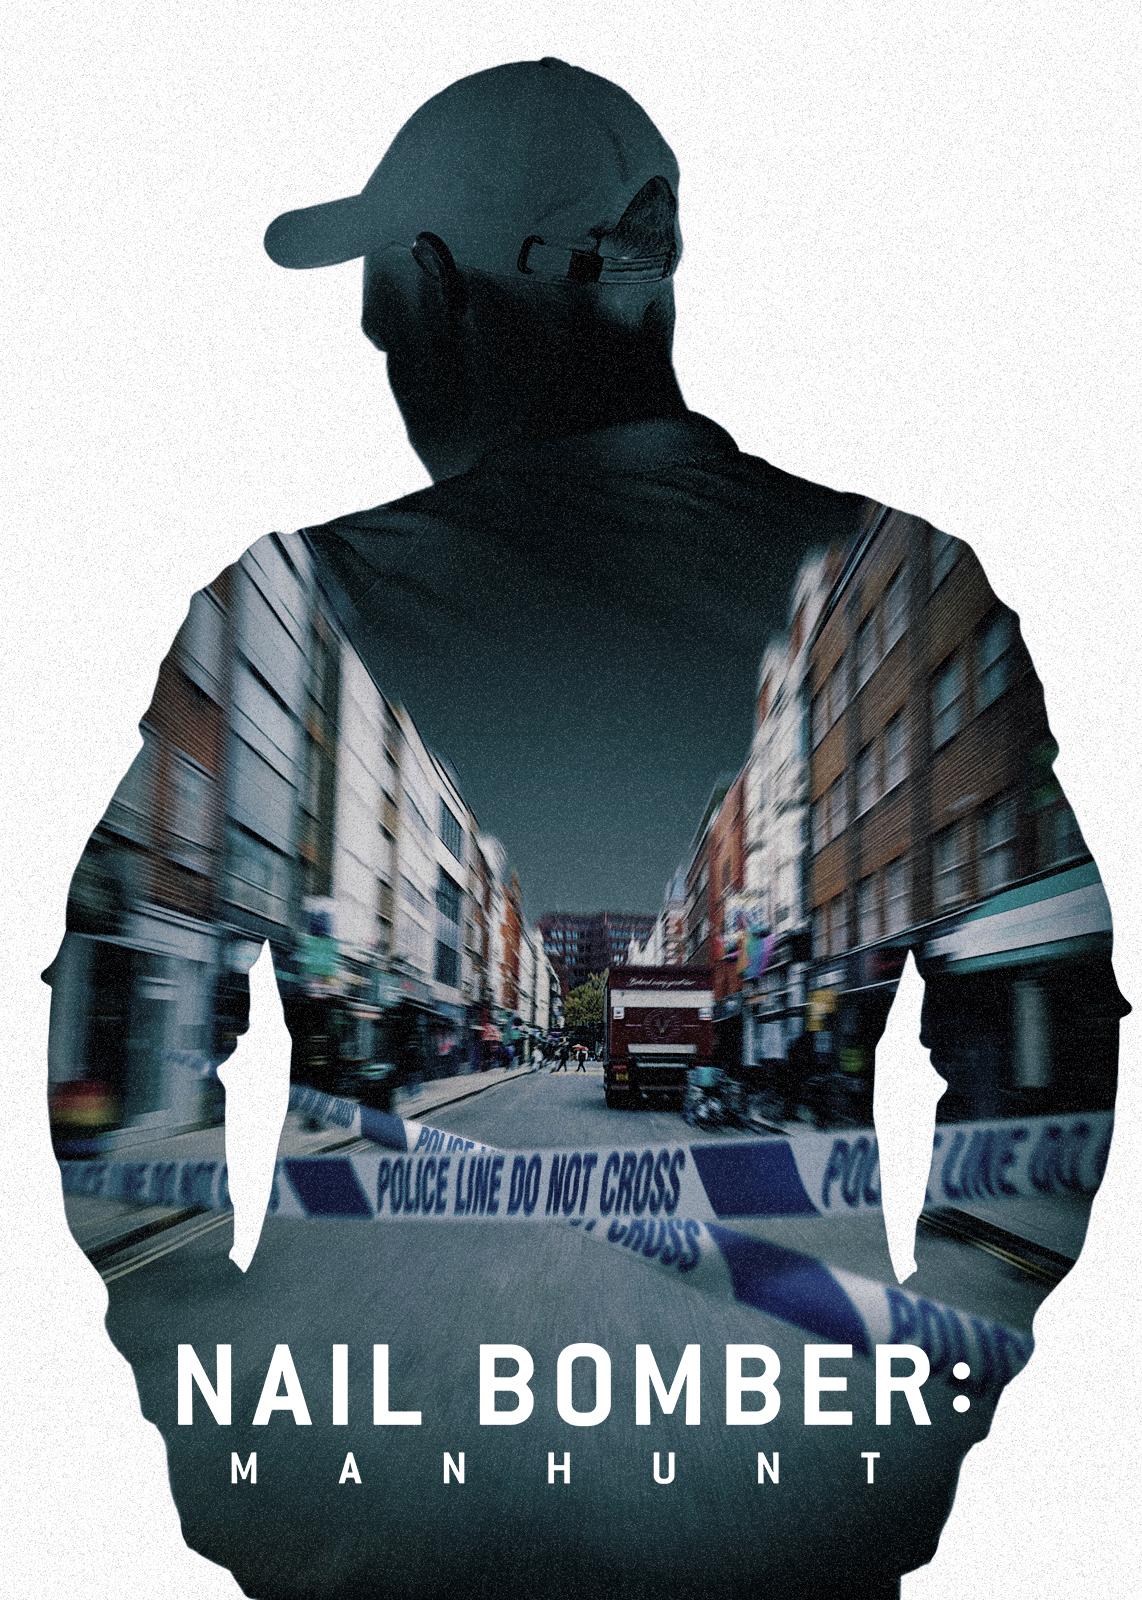 The Nailbomber